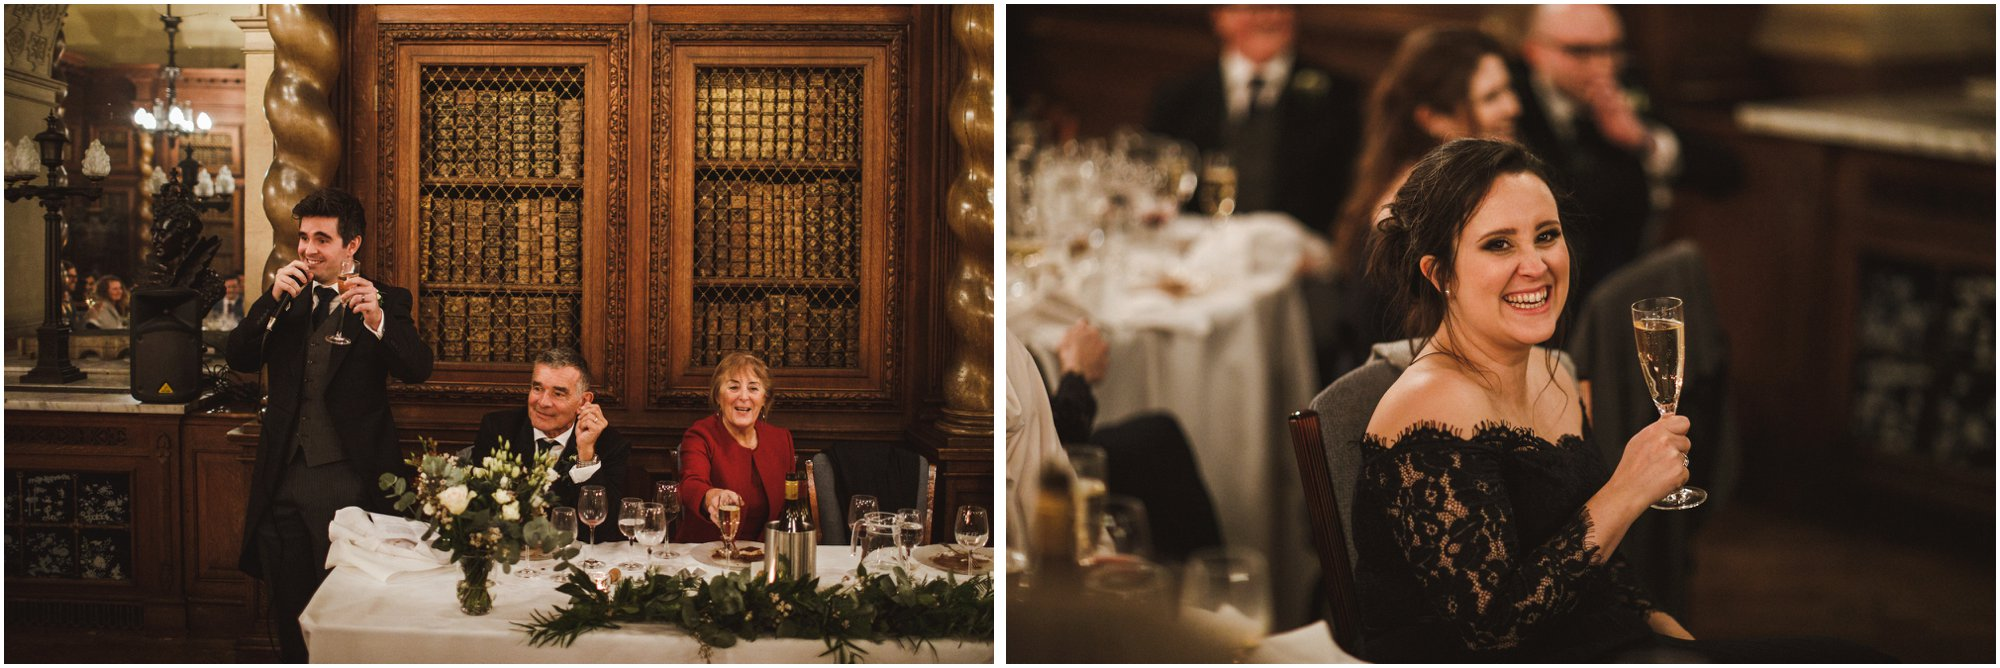 Burghley House Wedding Stamford_0150.jpg